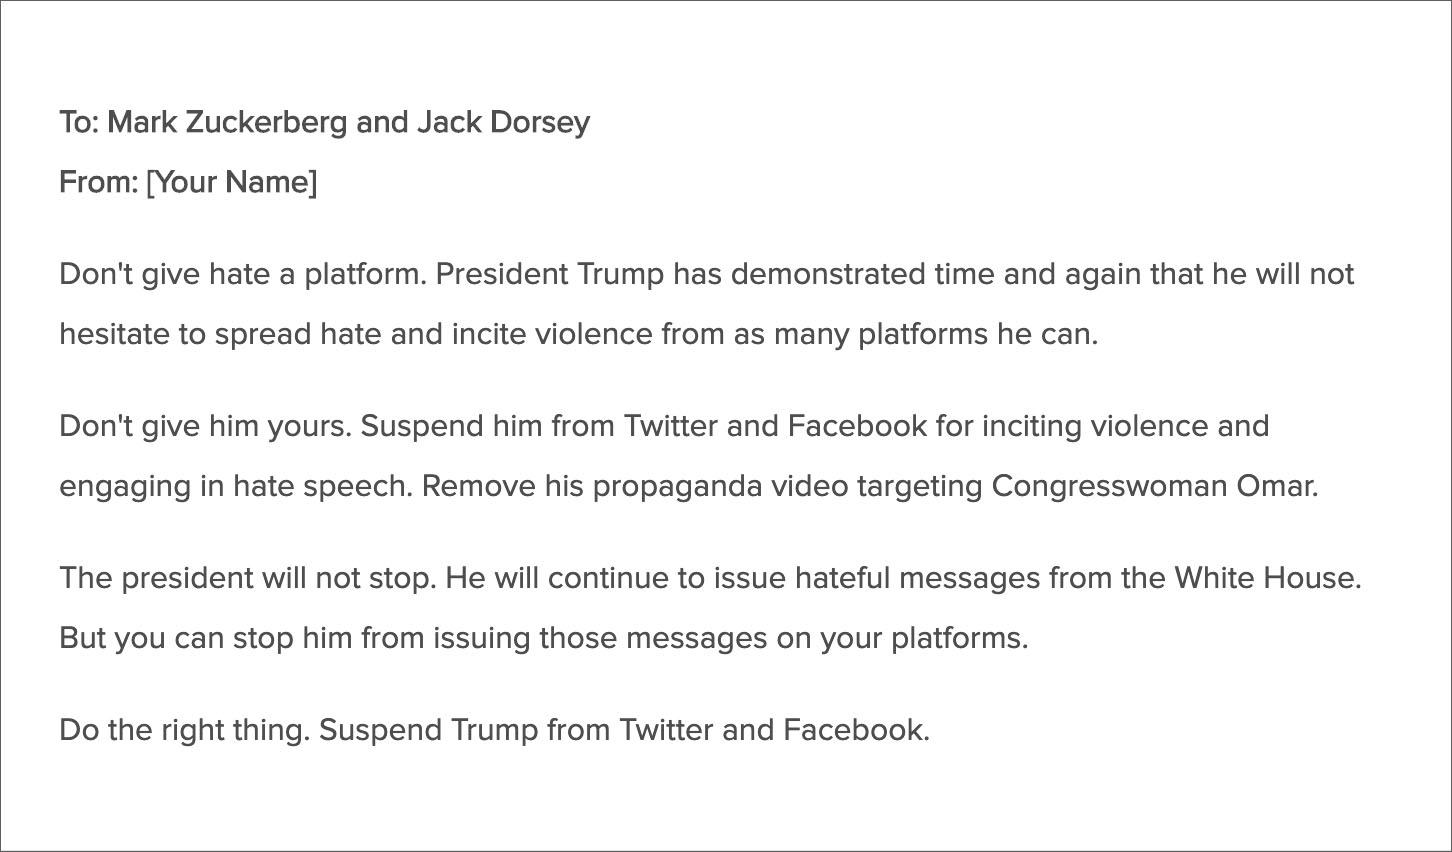 Women's March Demands Twitter, Facebook Ban President Trump For 'Hate'